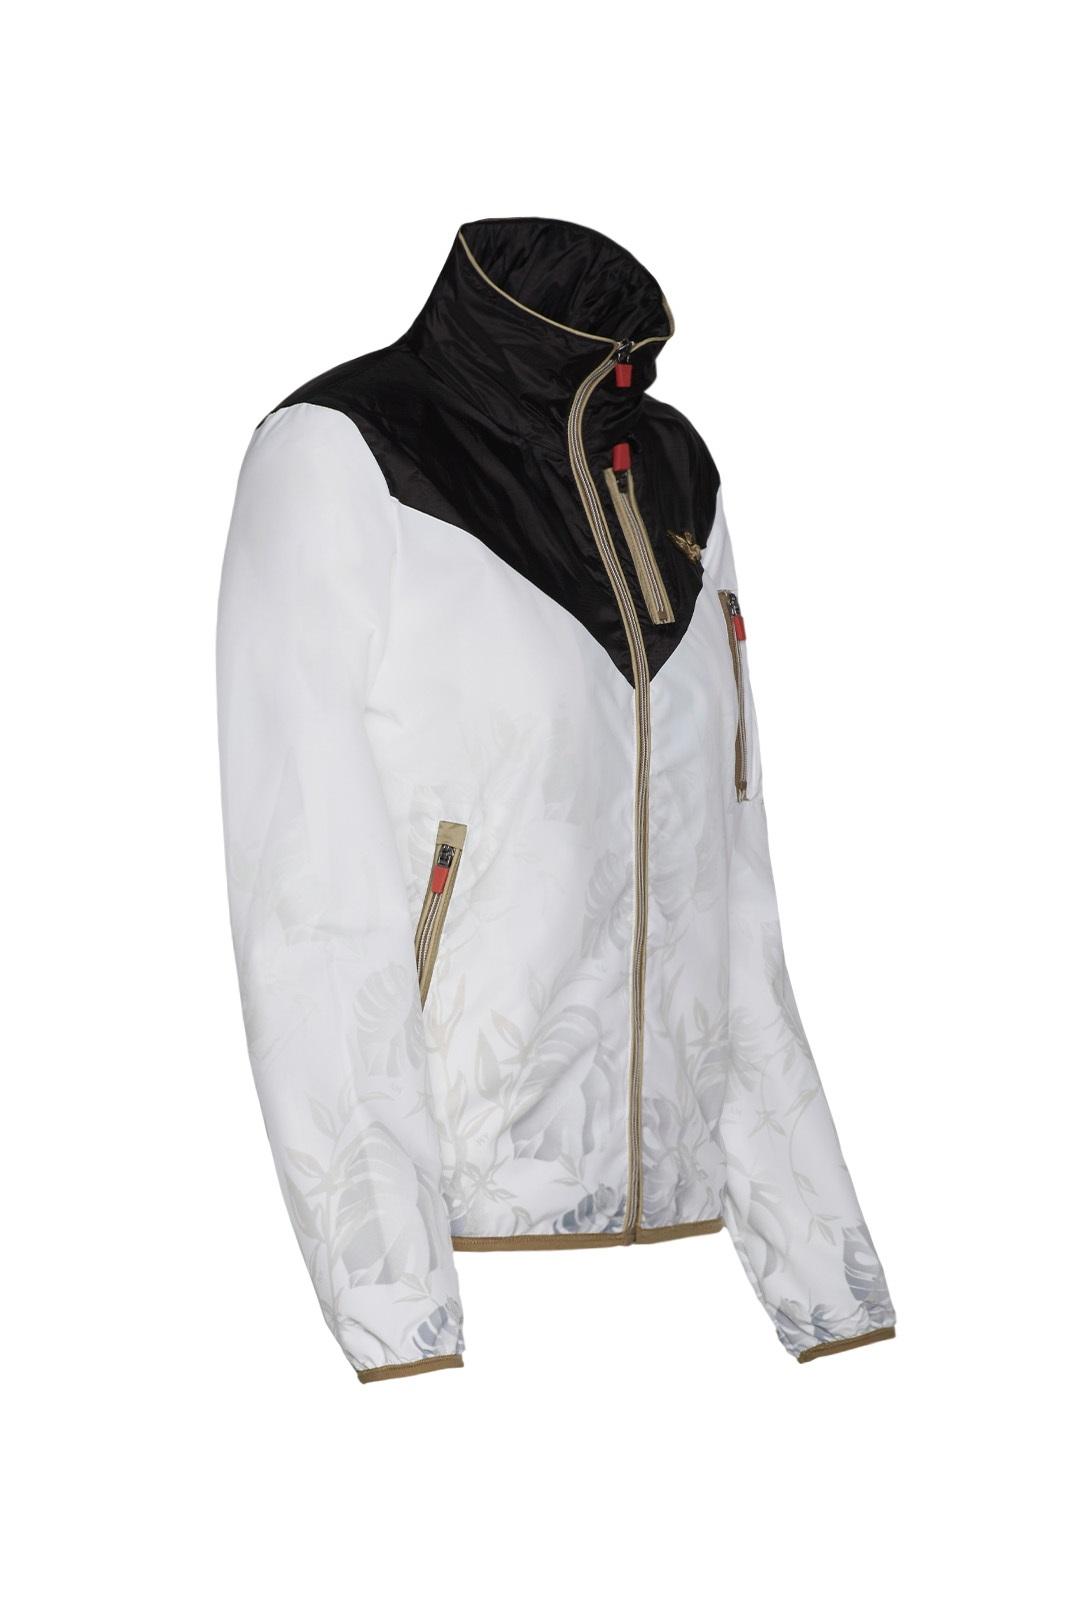 Tropical pattern Jacket                        3